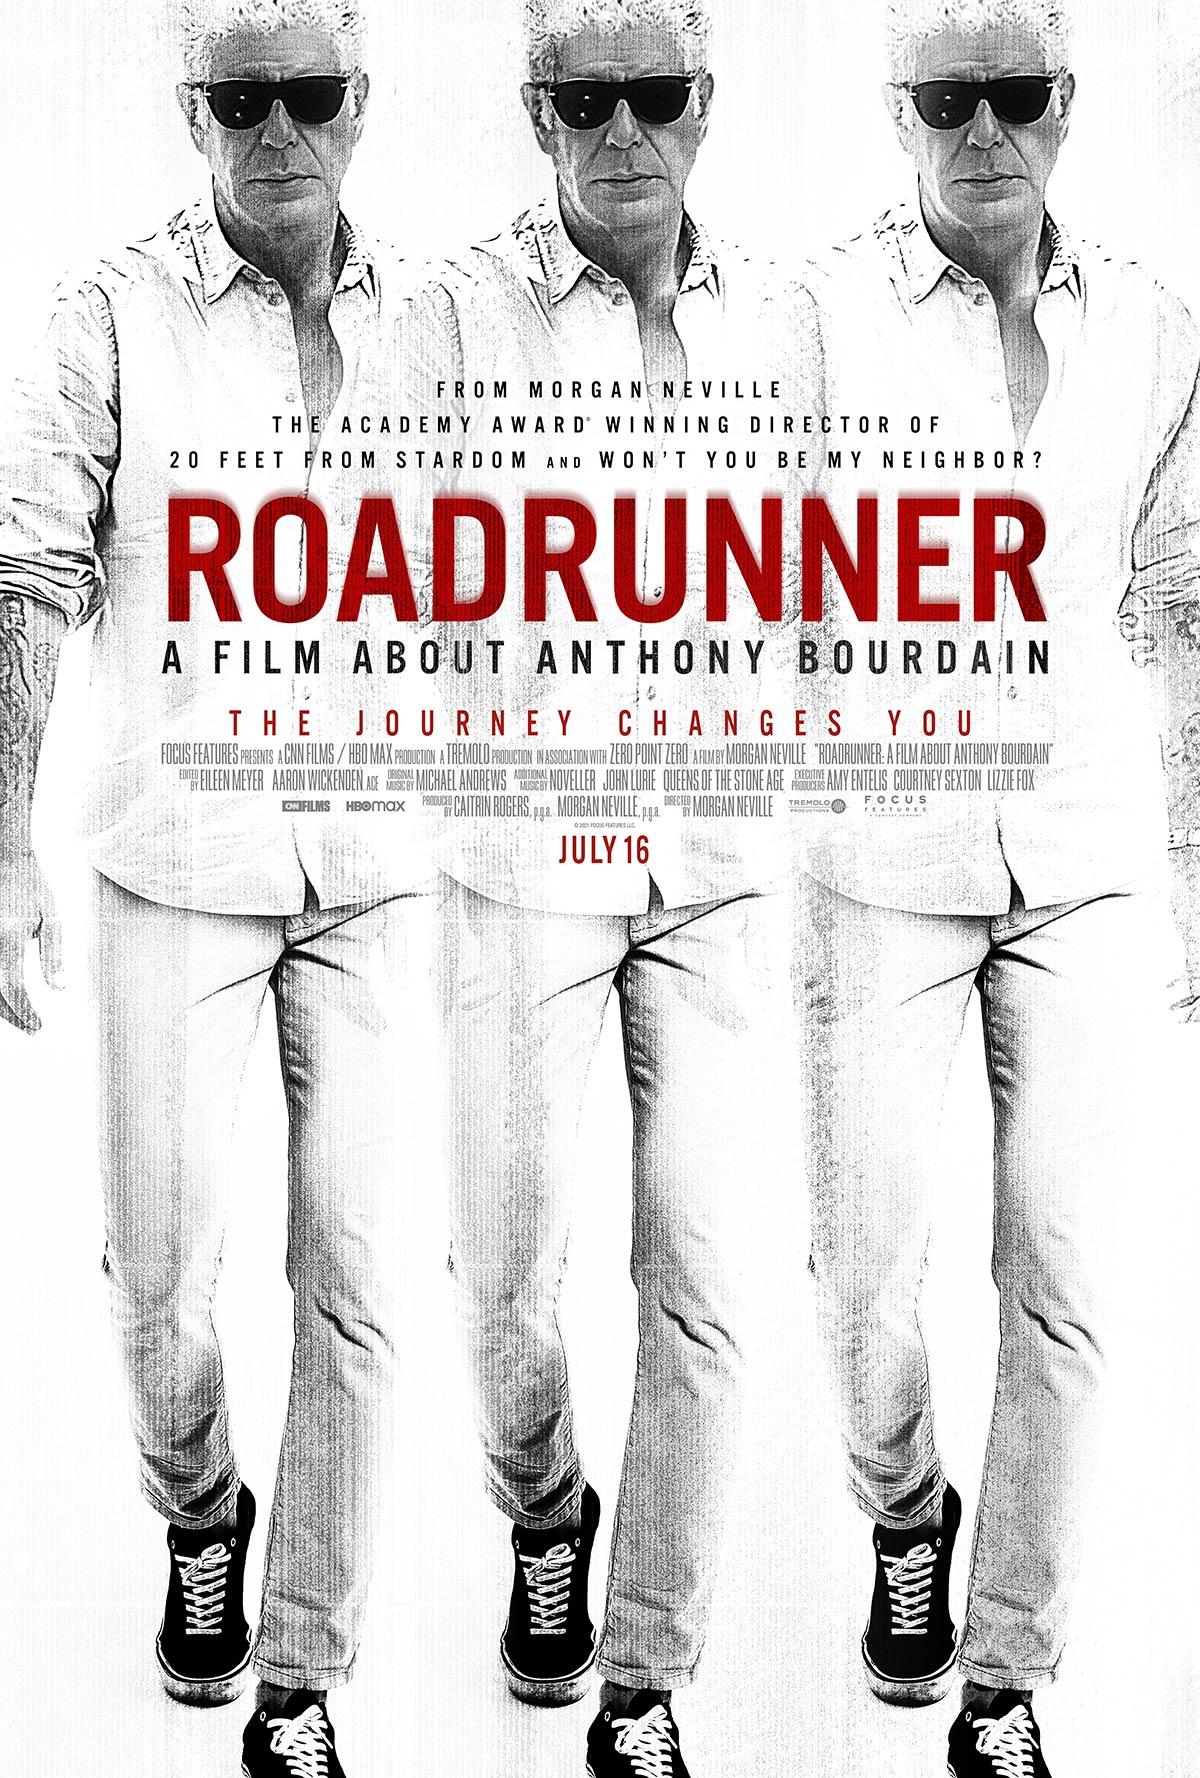 Roadrunner: A Film About Anthony Bourdain (2021) - IMDb